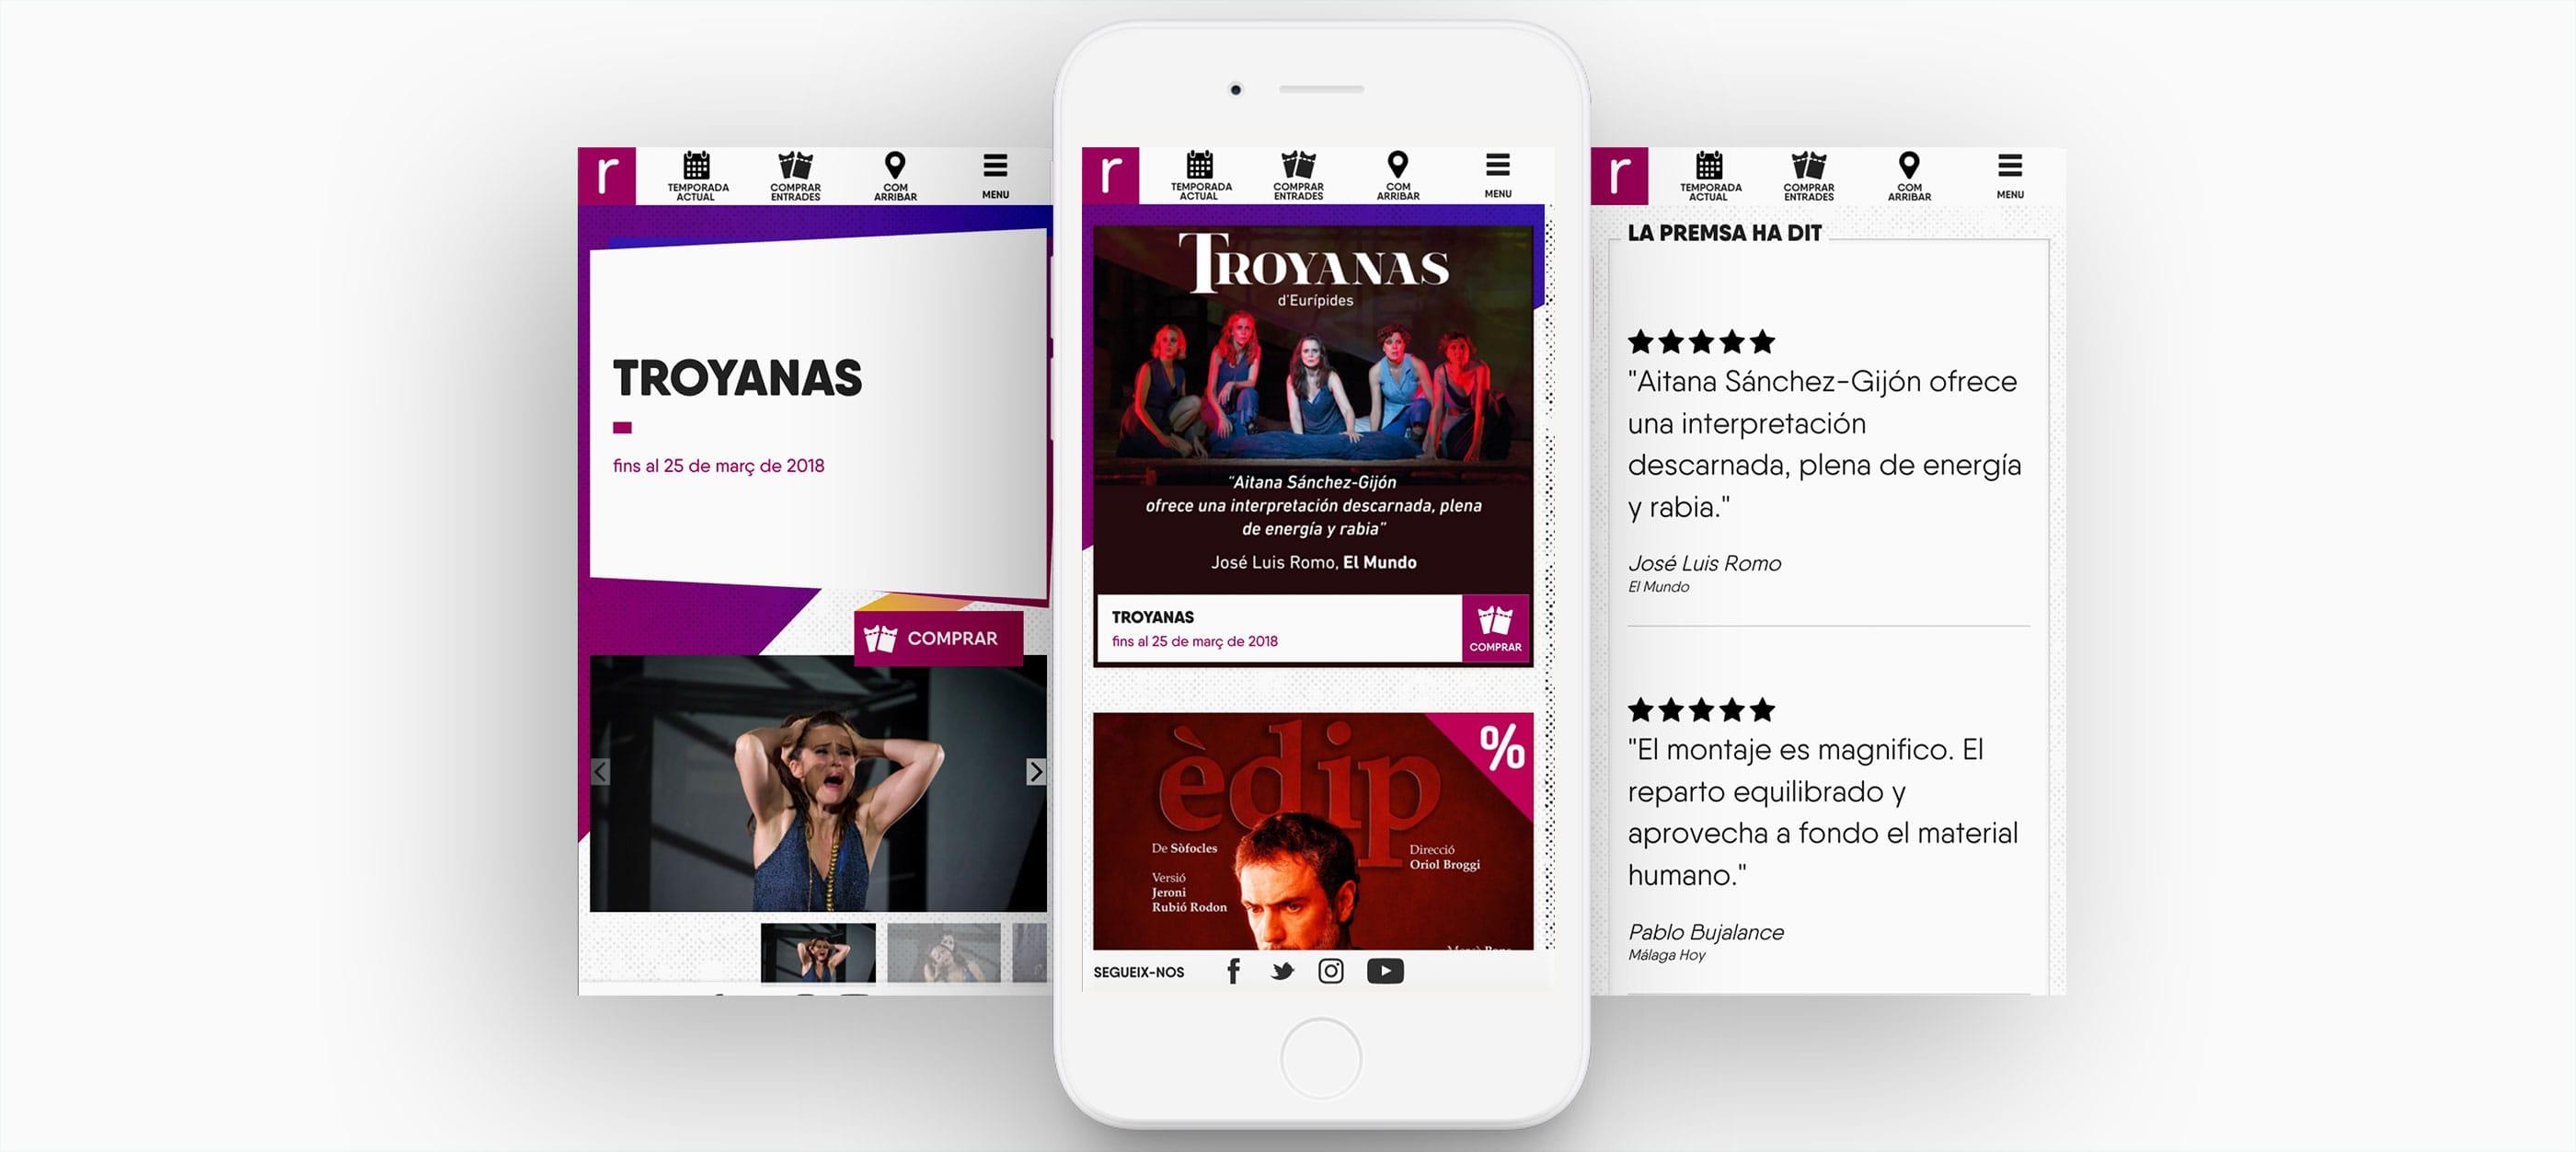 teatre romea barcelona pagina web